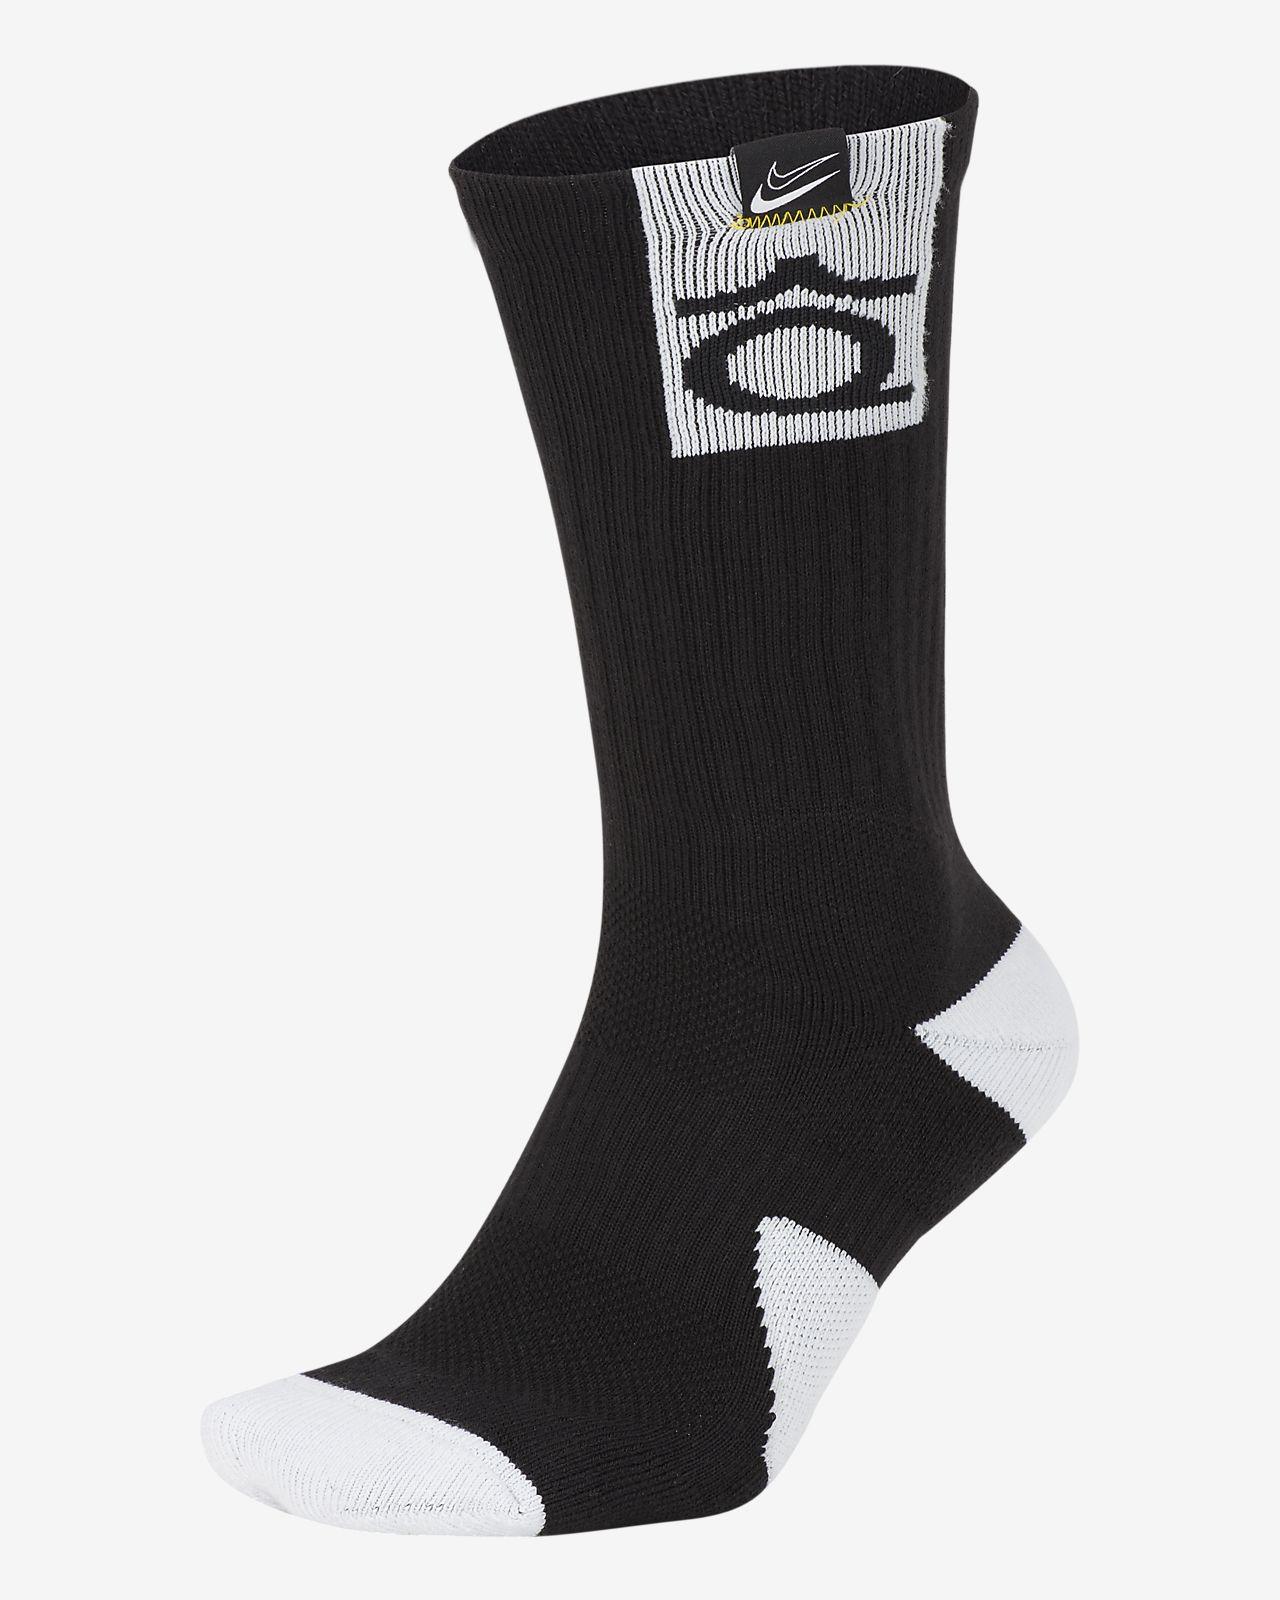 KD Nike Elite Basketball Crew Socks